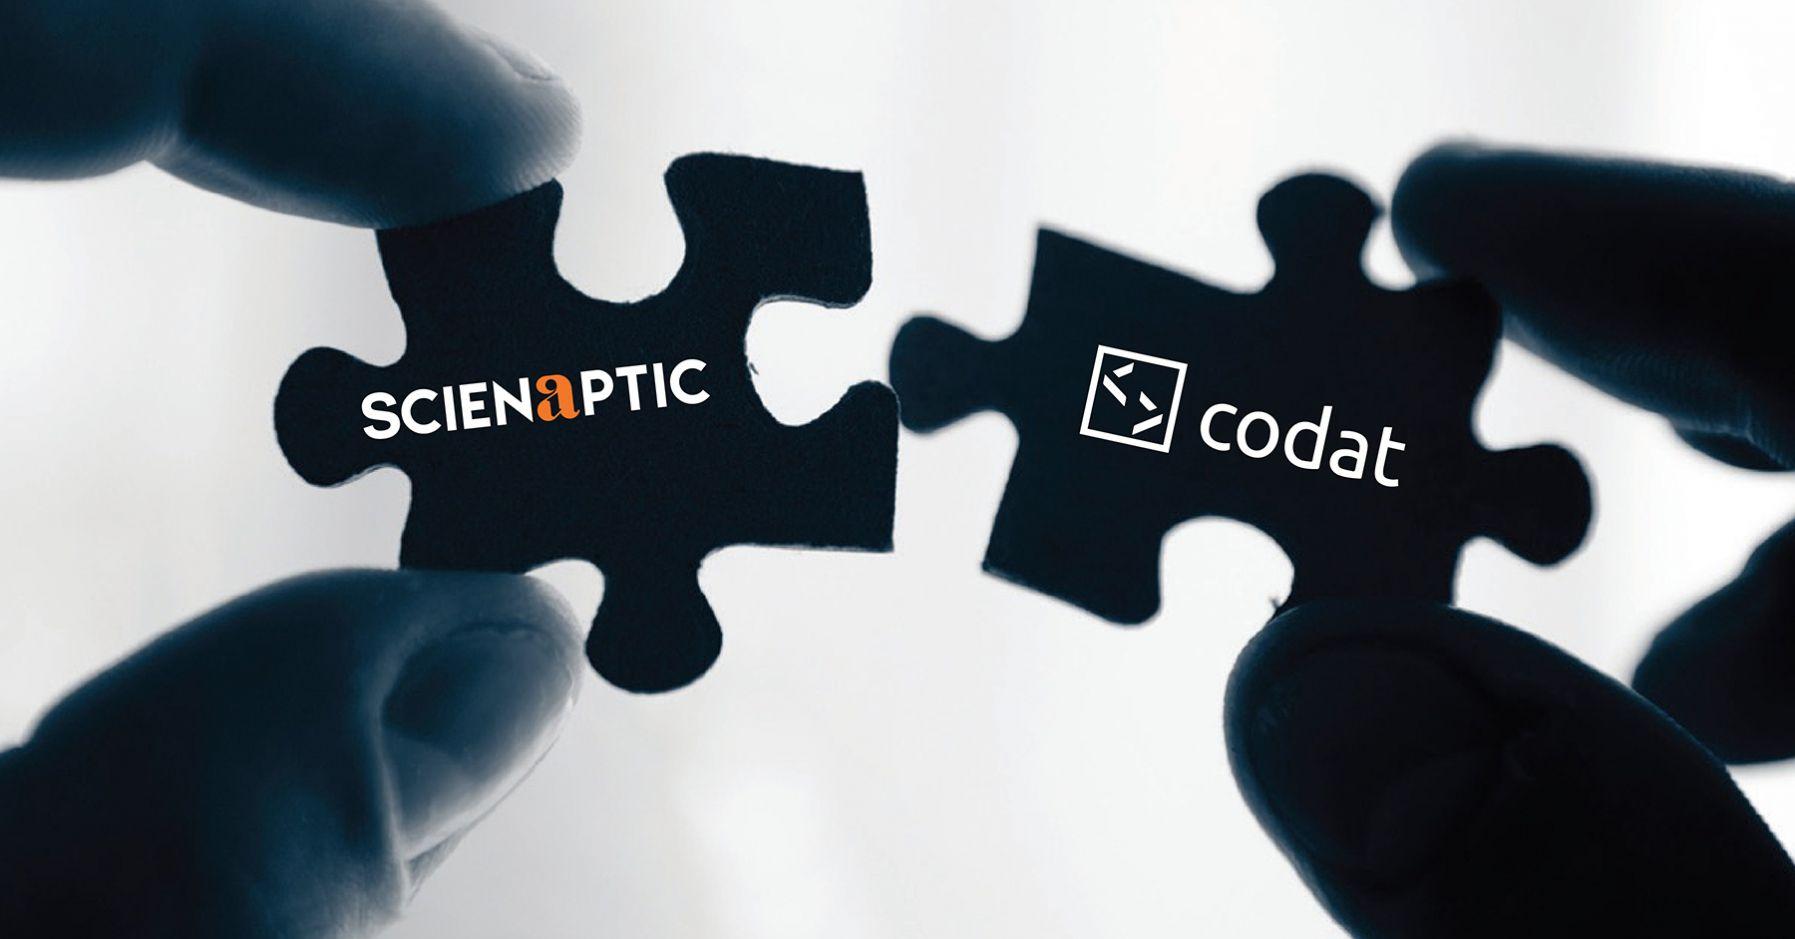 Codat and Scienaptic AI partner